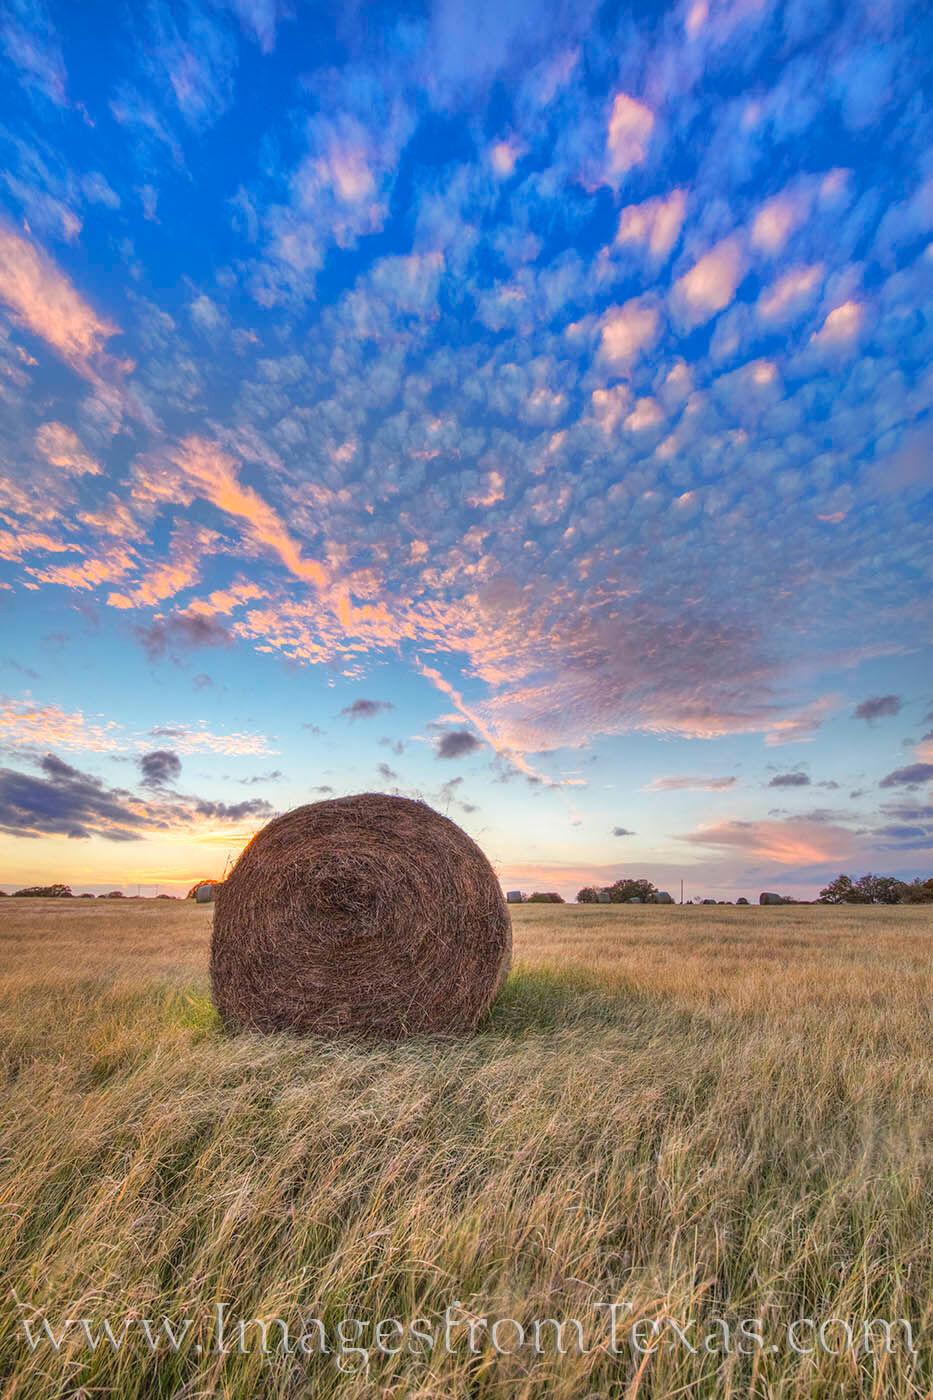 hay bales,hay bales images,texas hay,texas sunset,texas ranch images, photo